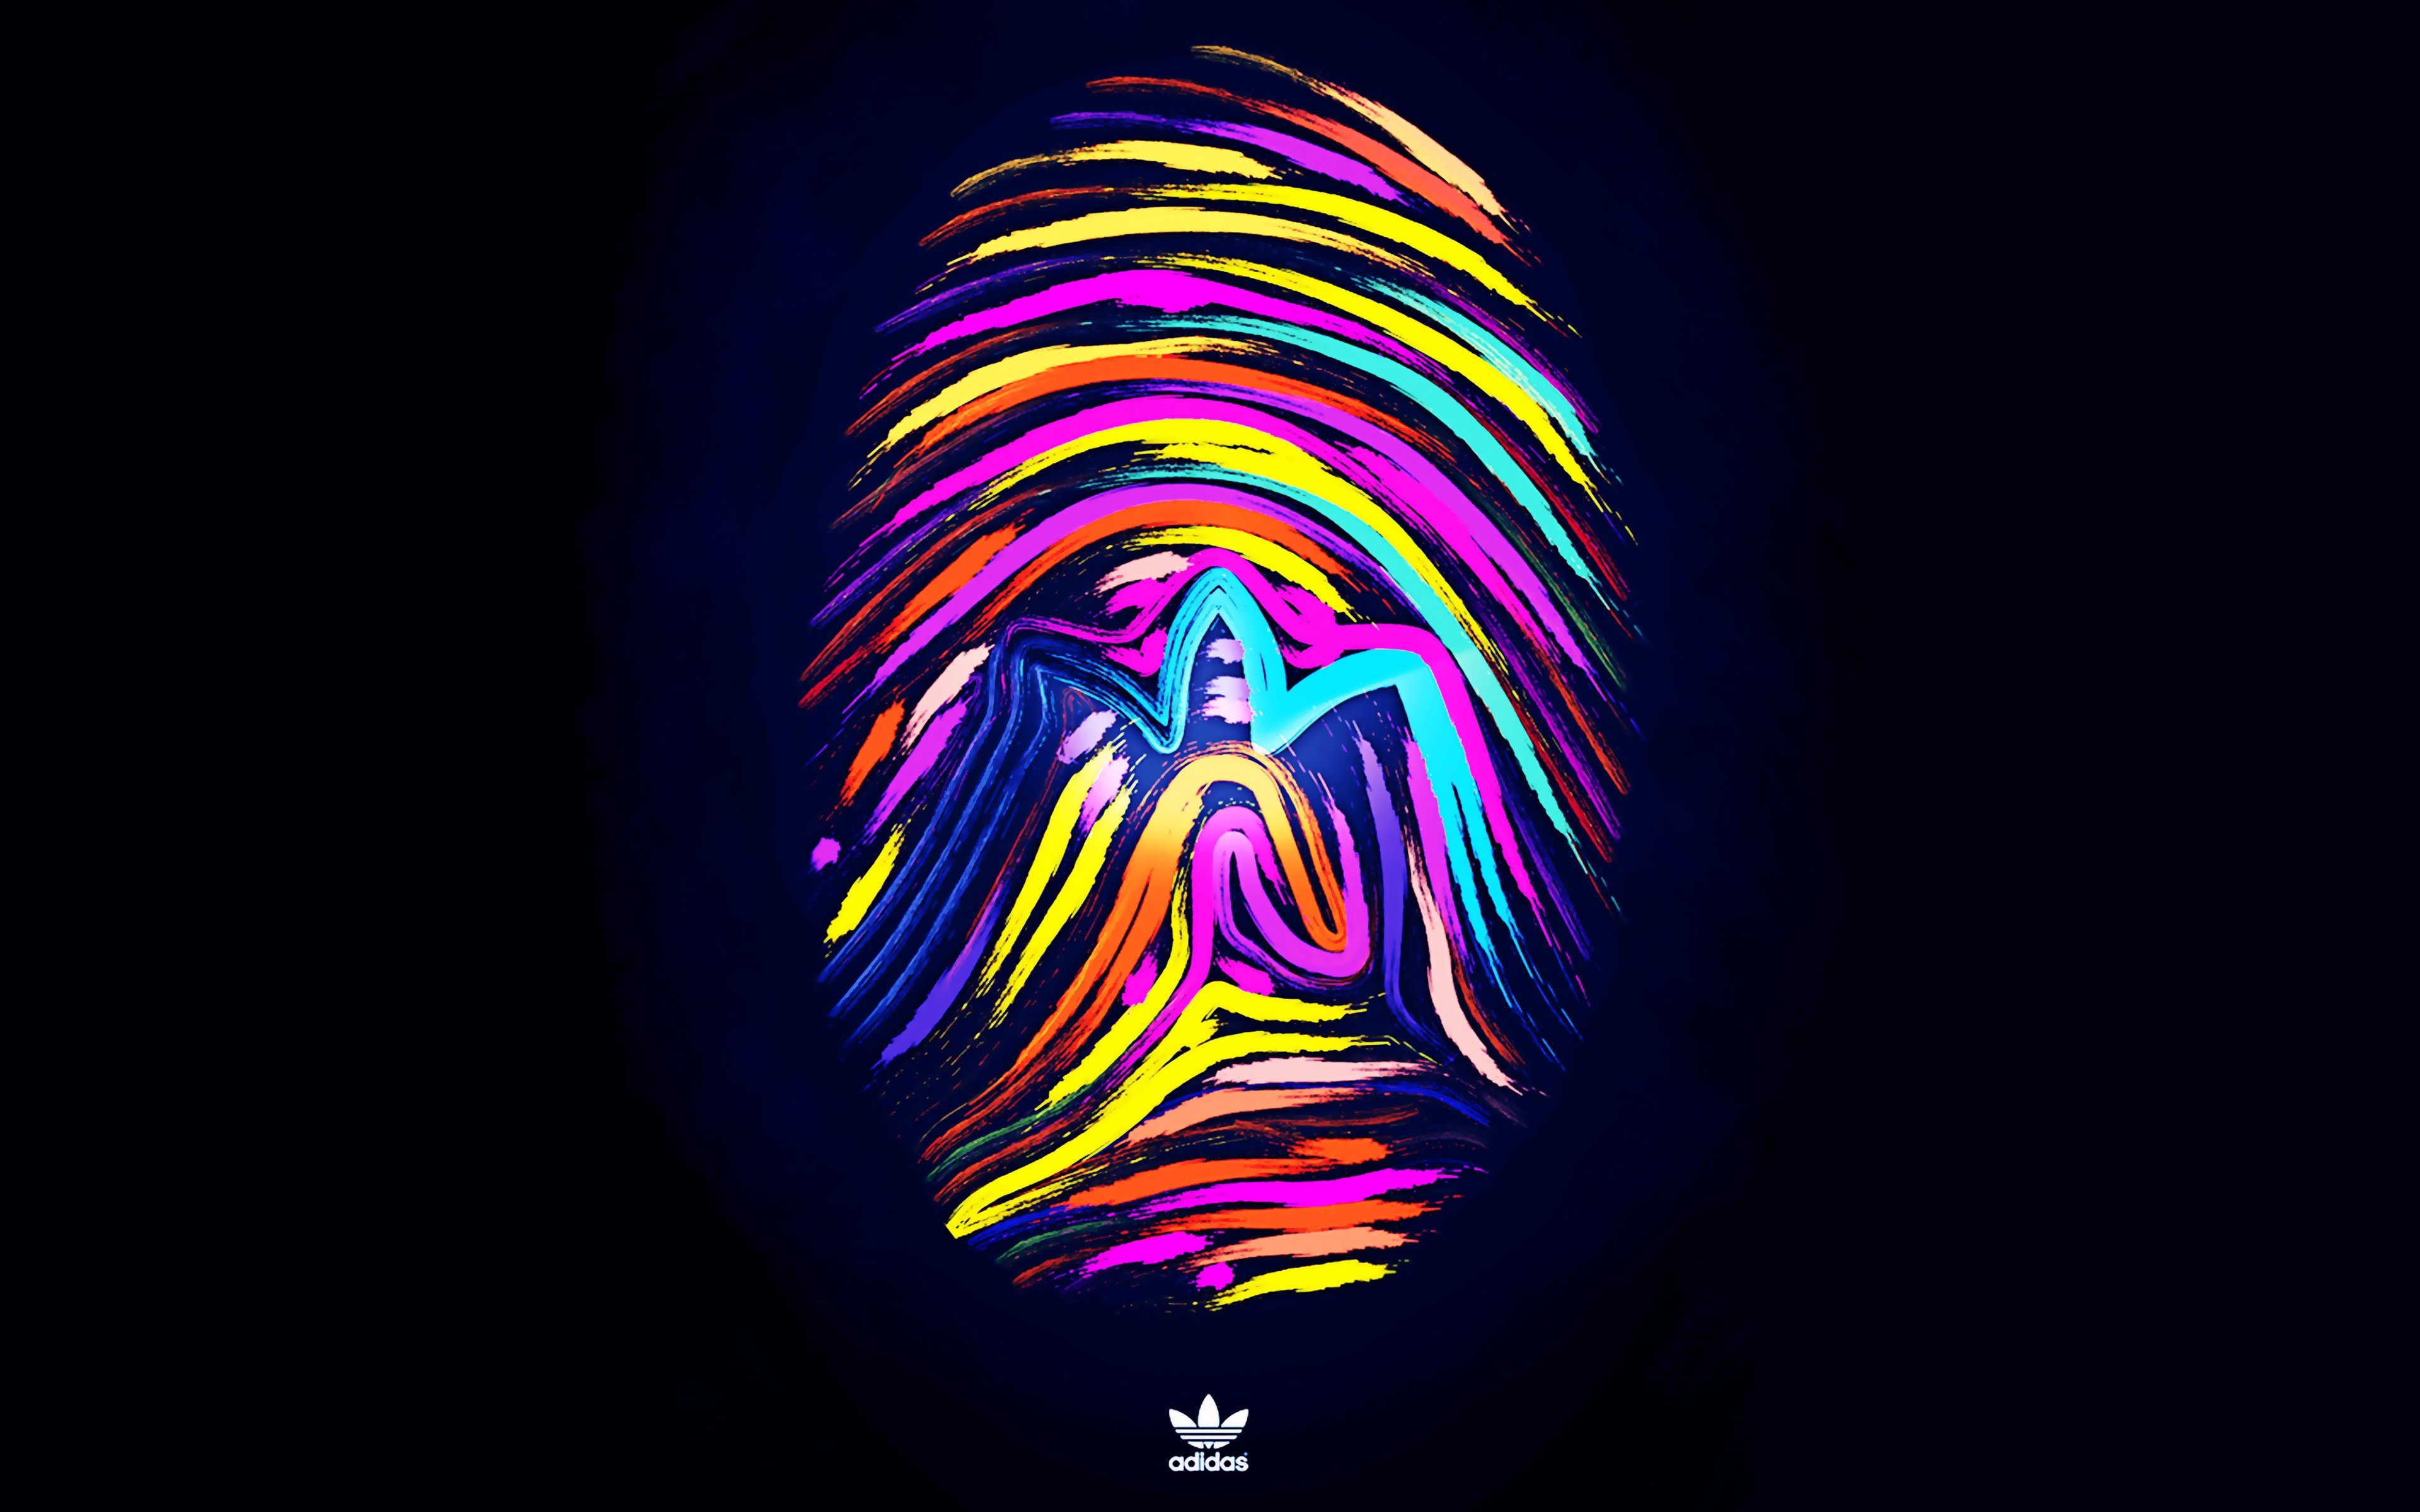 Fingerprints brand make ADIDAS sports background 3840x2400